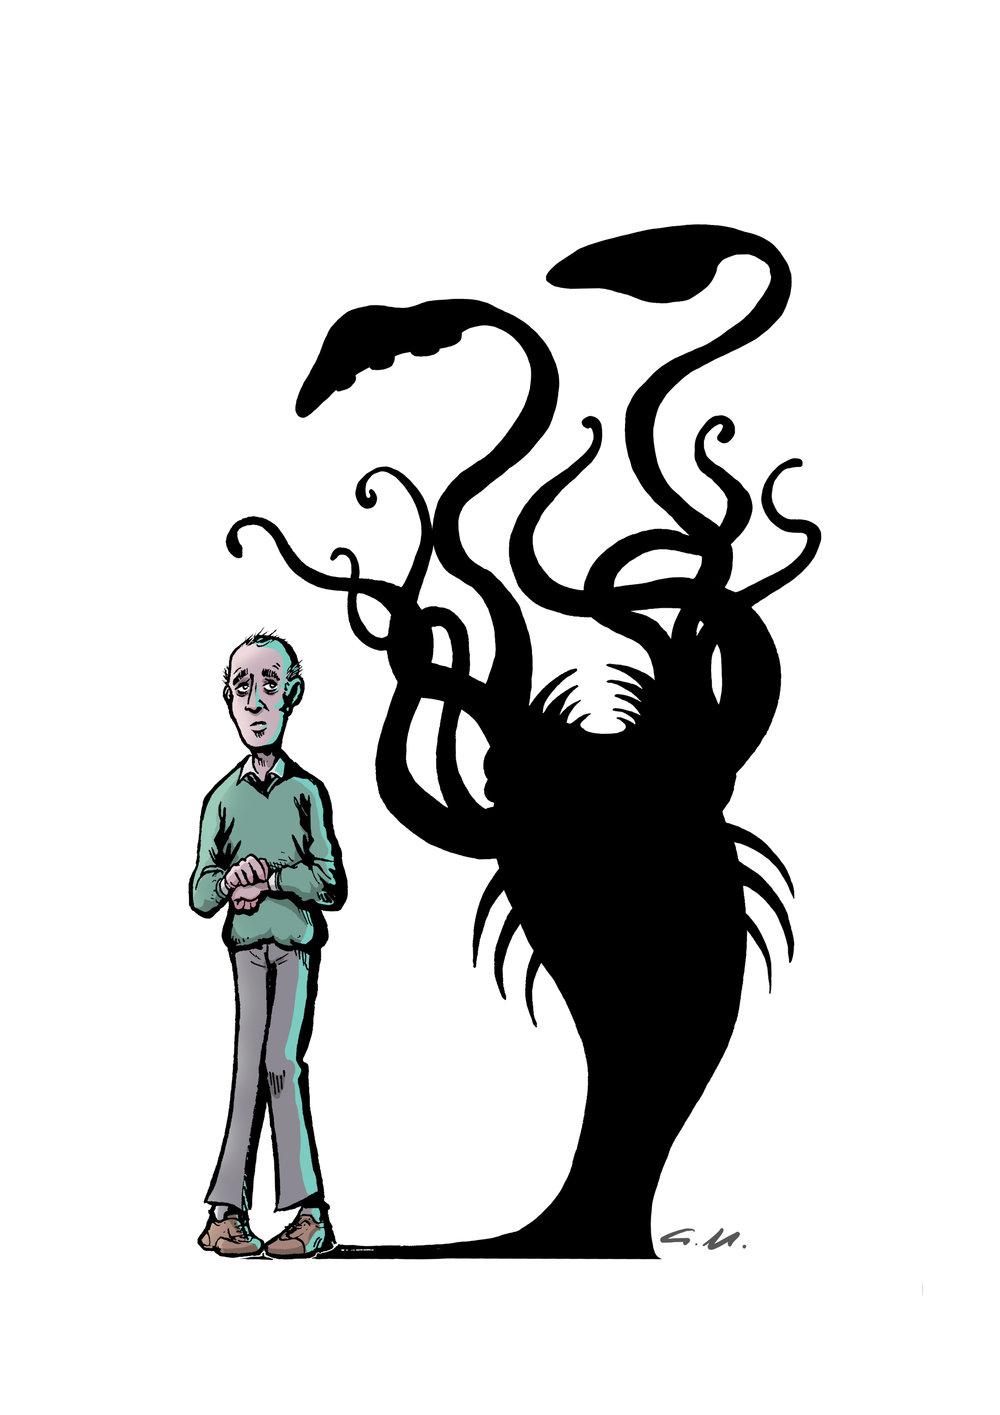 calamari george shadow rgb.jpg